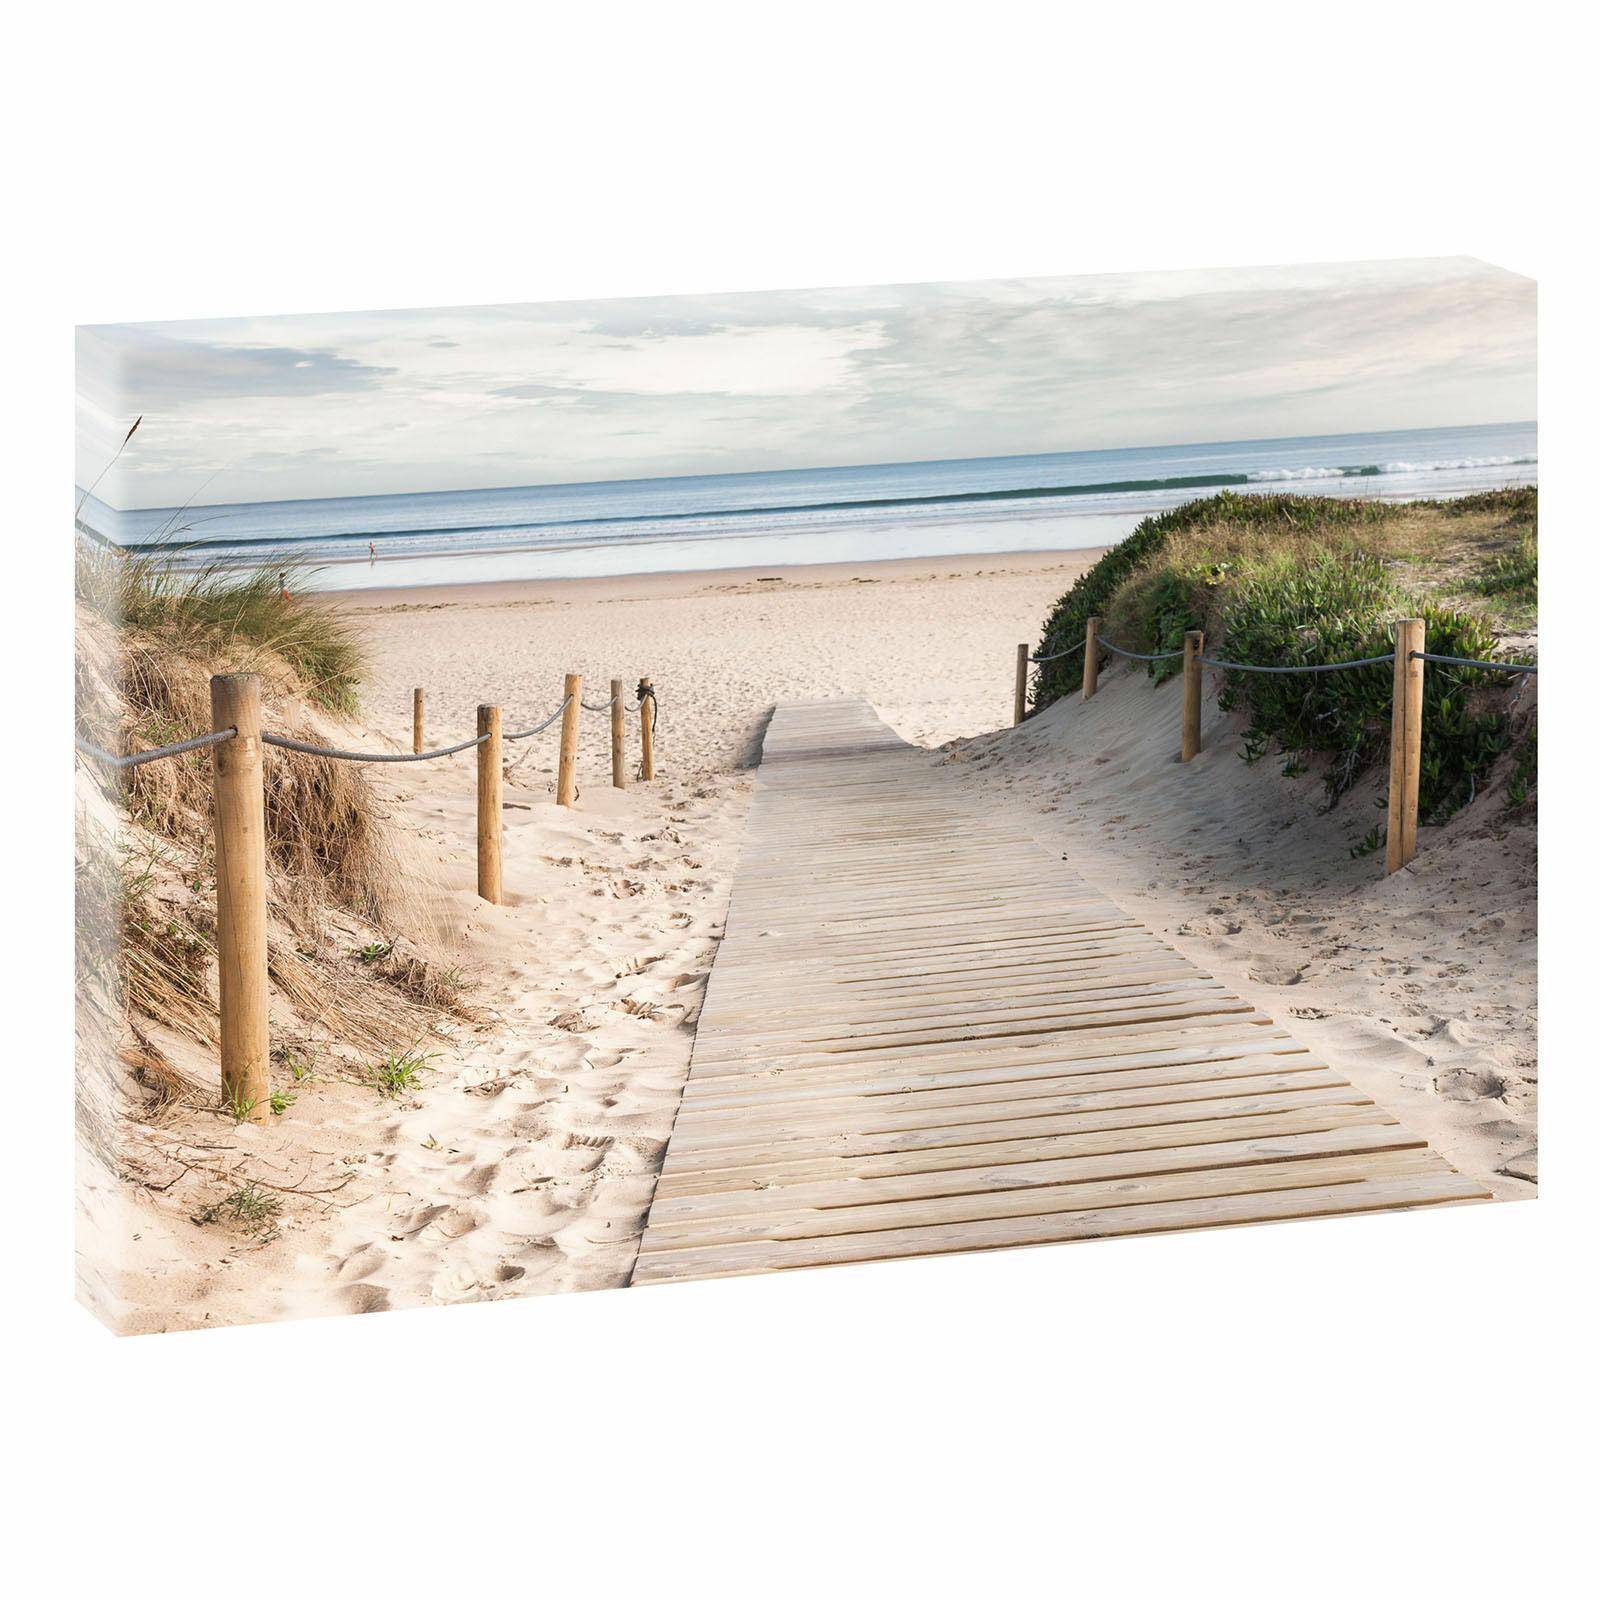 Meer Bild Strand Fotoleinwand  Wandbild Leinwand Poster XXL 120 cm*80 cm 204